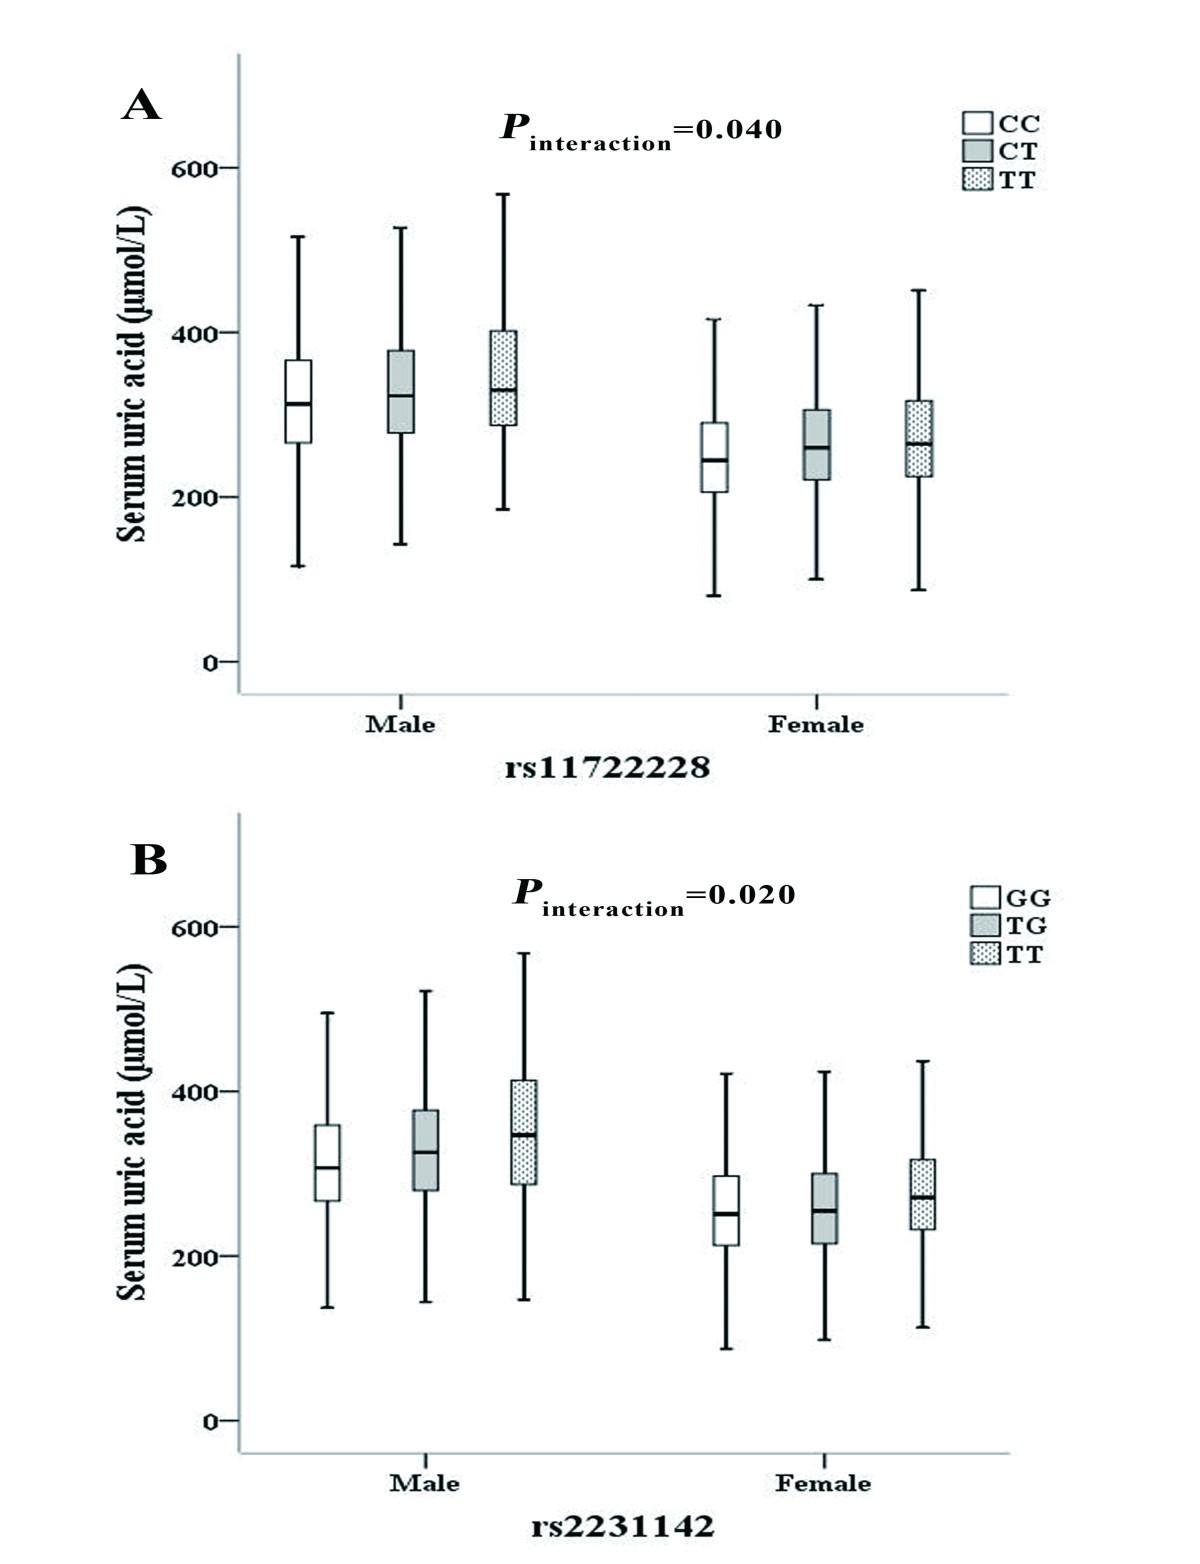 A Genome Wide Association Study Identifies Common Variants E Cigarette Block Diagram Figure 2